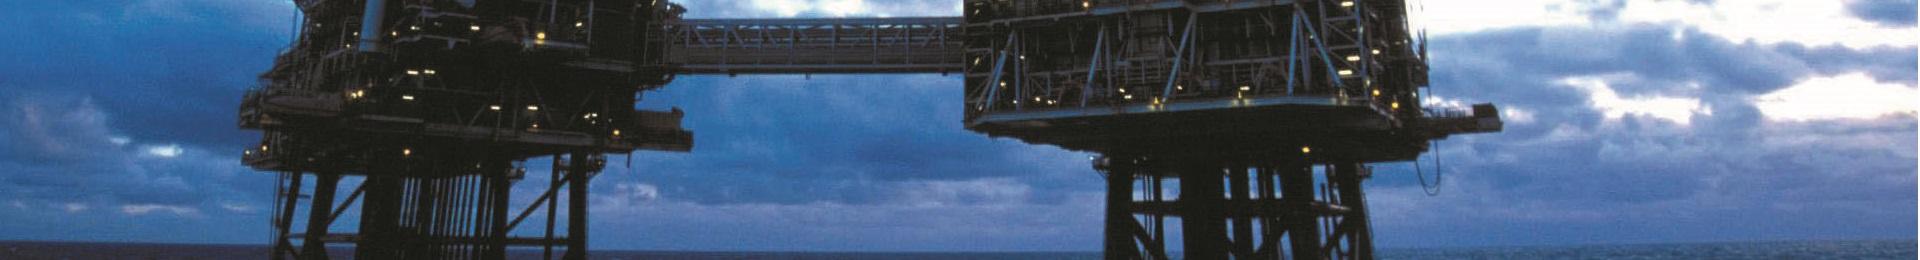 industry-onshore-offshore